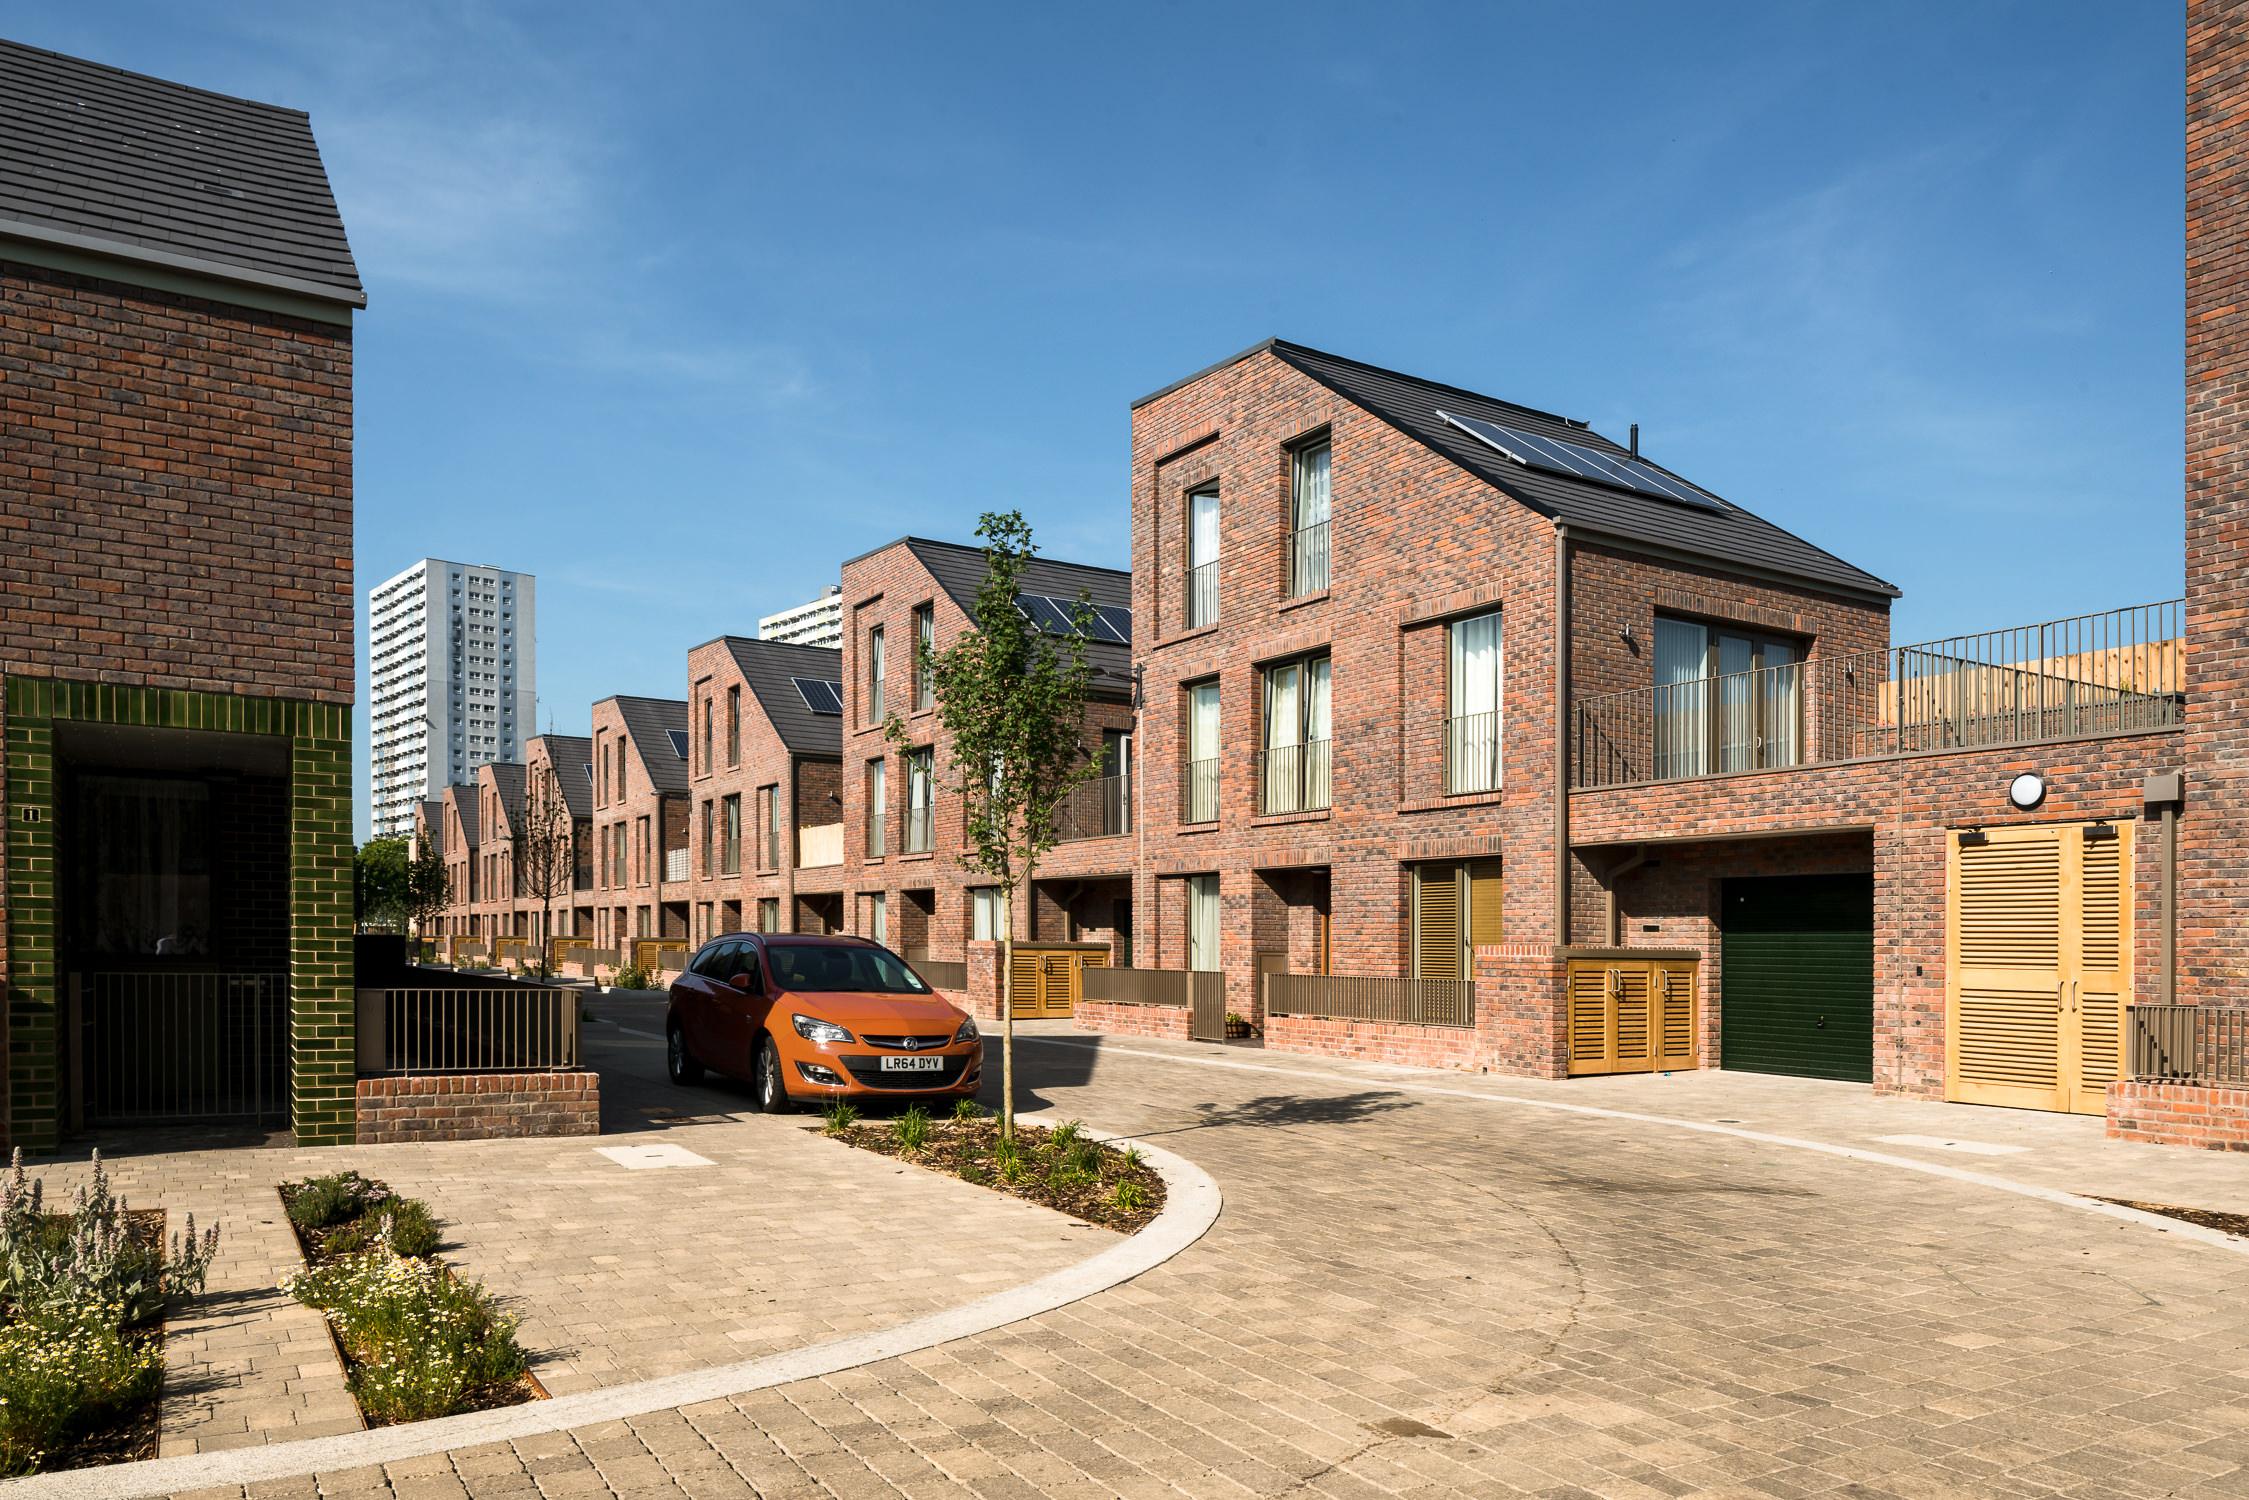 mark-hadden-architecture-photographer-architectuur-interieur-fotografie-london-amsterdam-Dujardin-Mews-169a.jpg